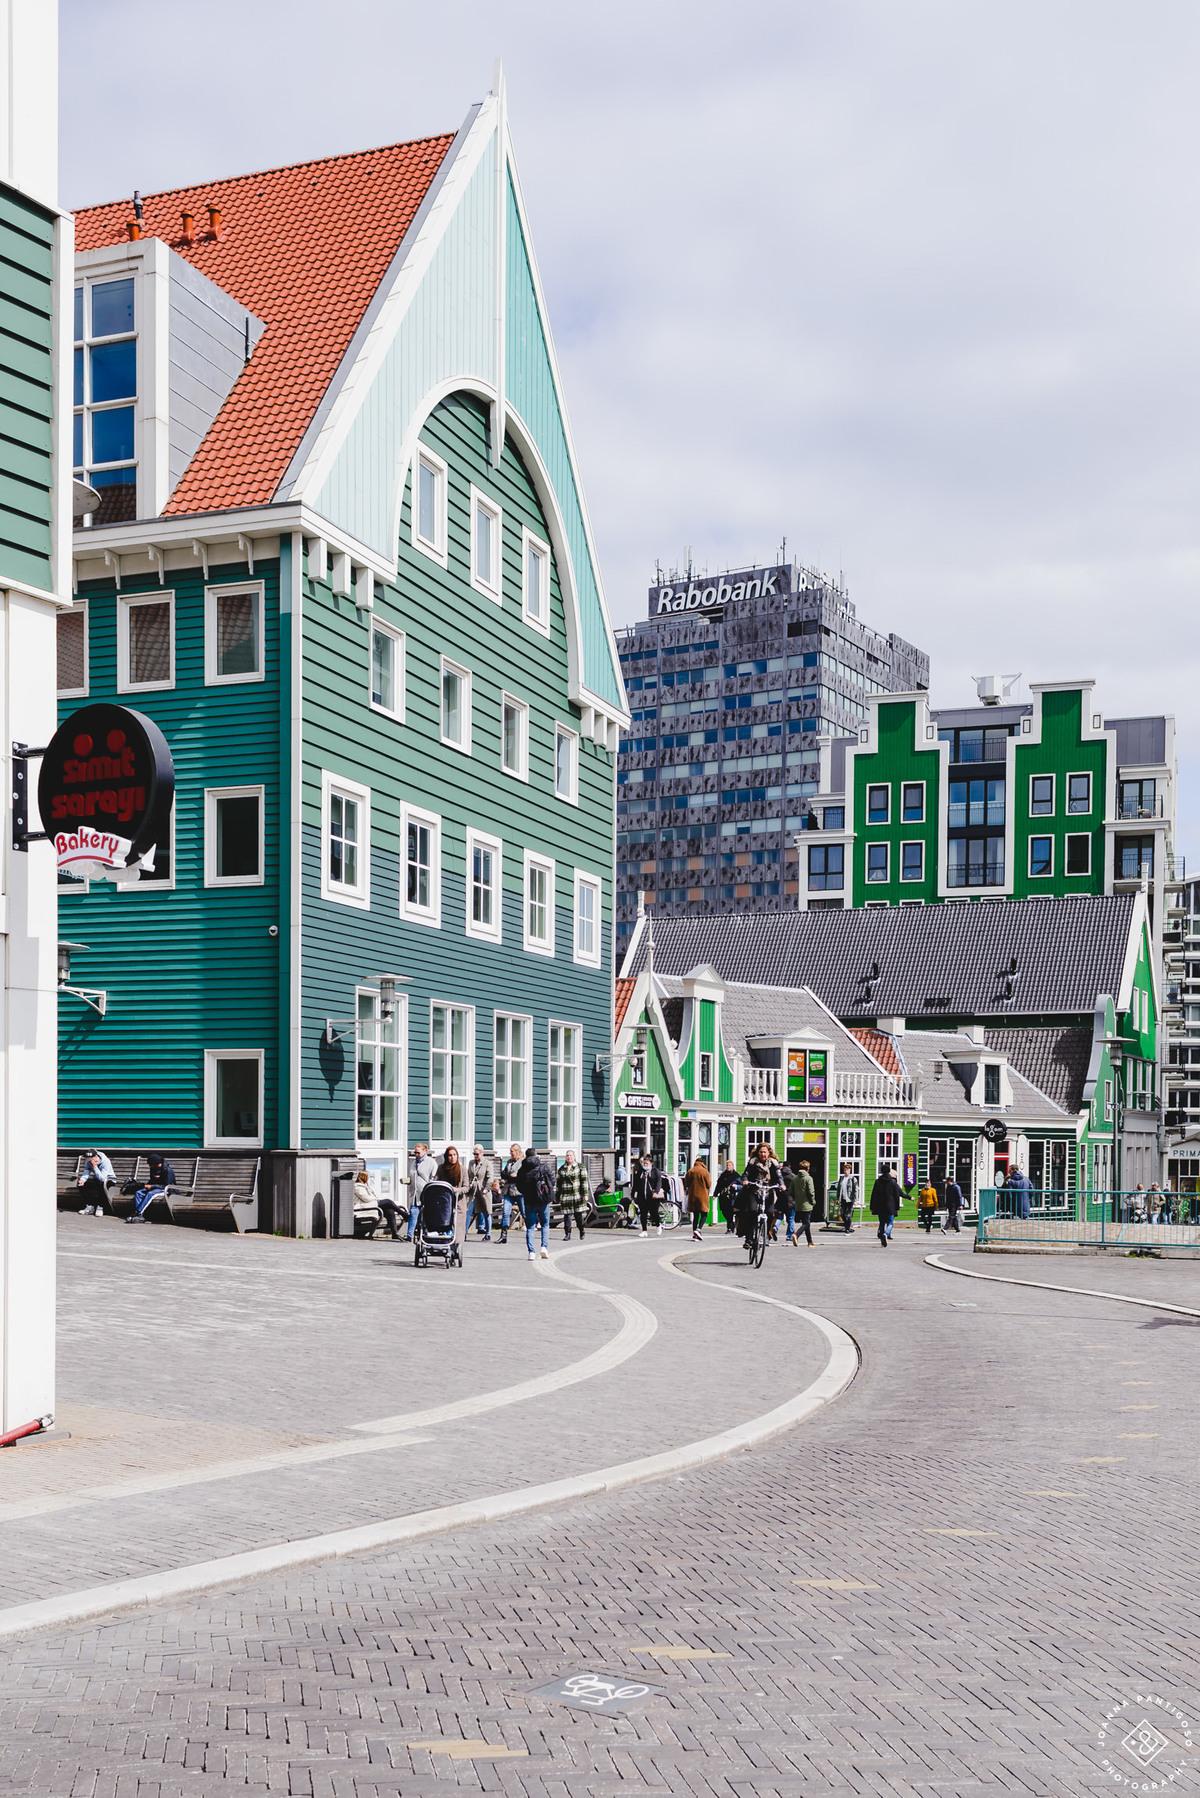 Imagem capa - Let's go to Zaandam - Easy getaways from Amsterdam, NL por Joanna Pantigoso